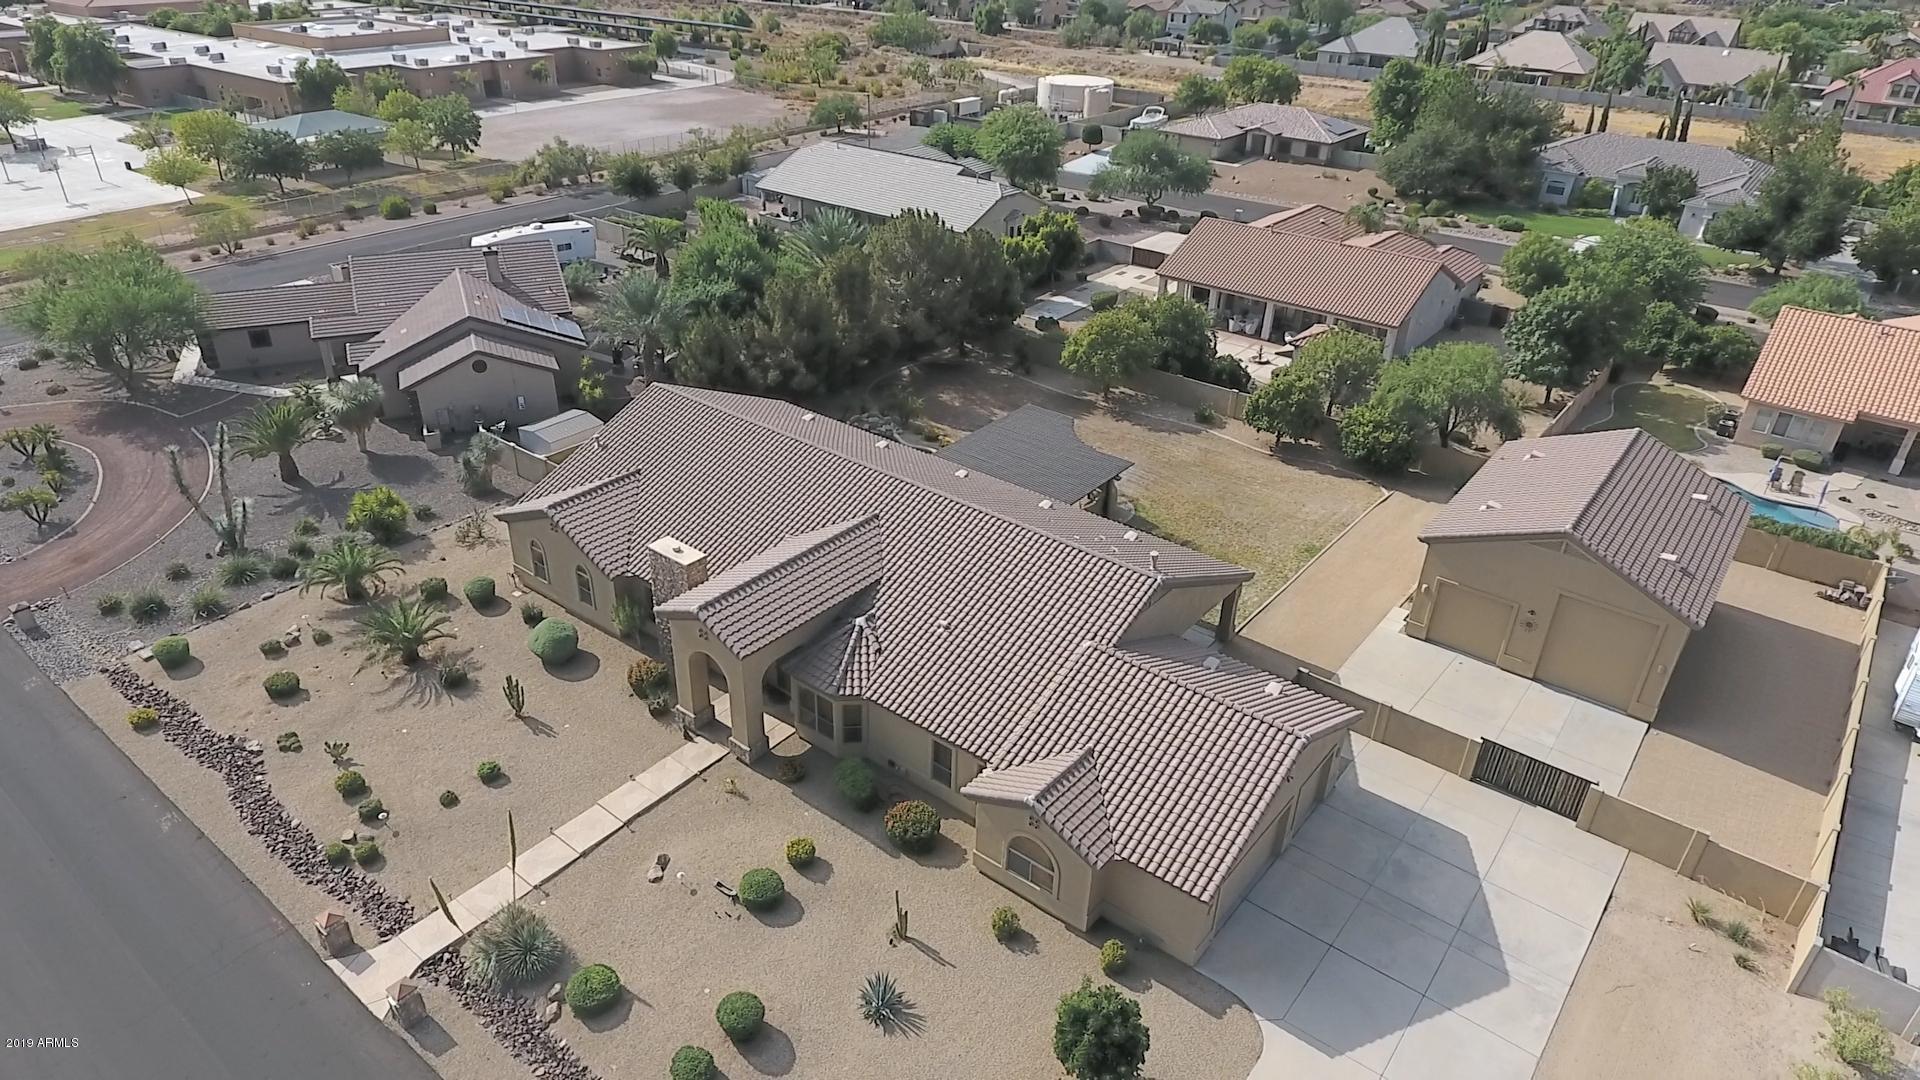 MLS 5959984 12711 W DENTON Avenue, Litchfield Park, AZ 85340 Litchfield Park AZ Three Bedroom